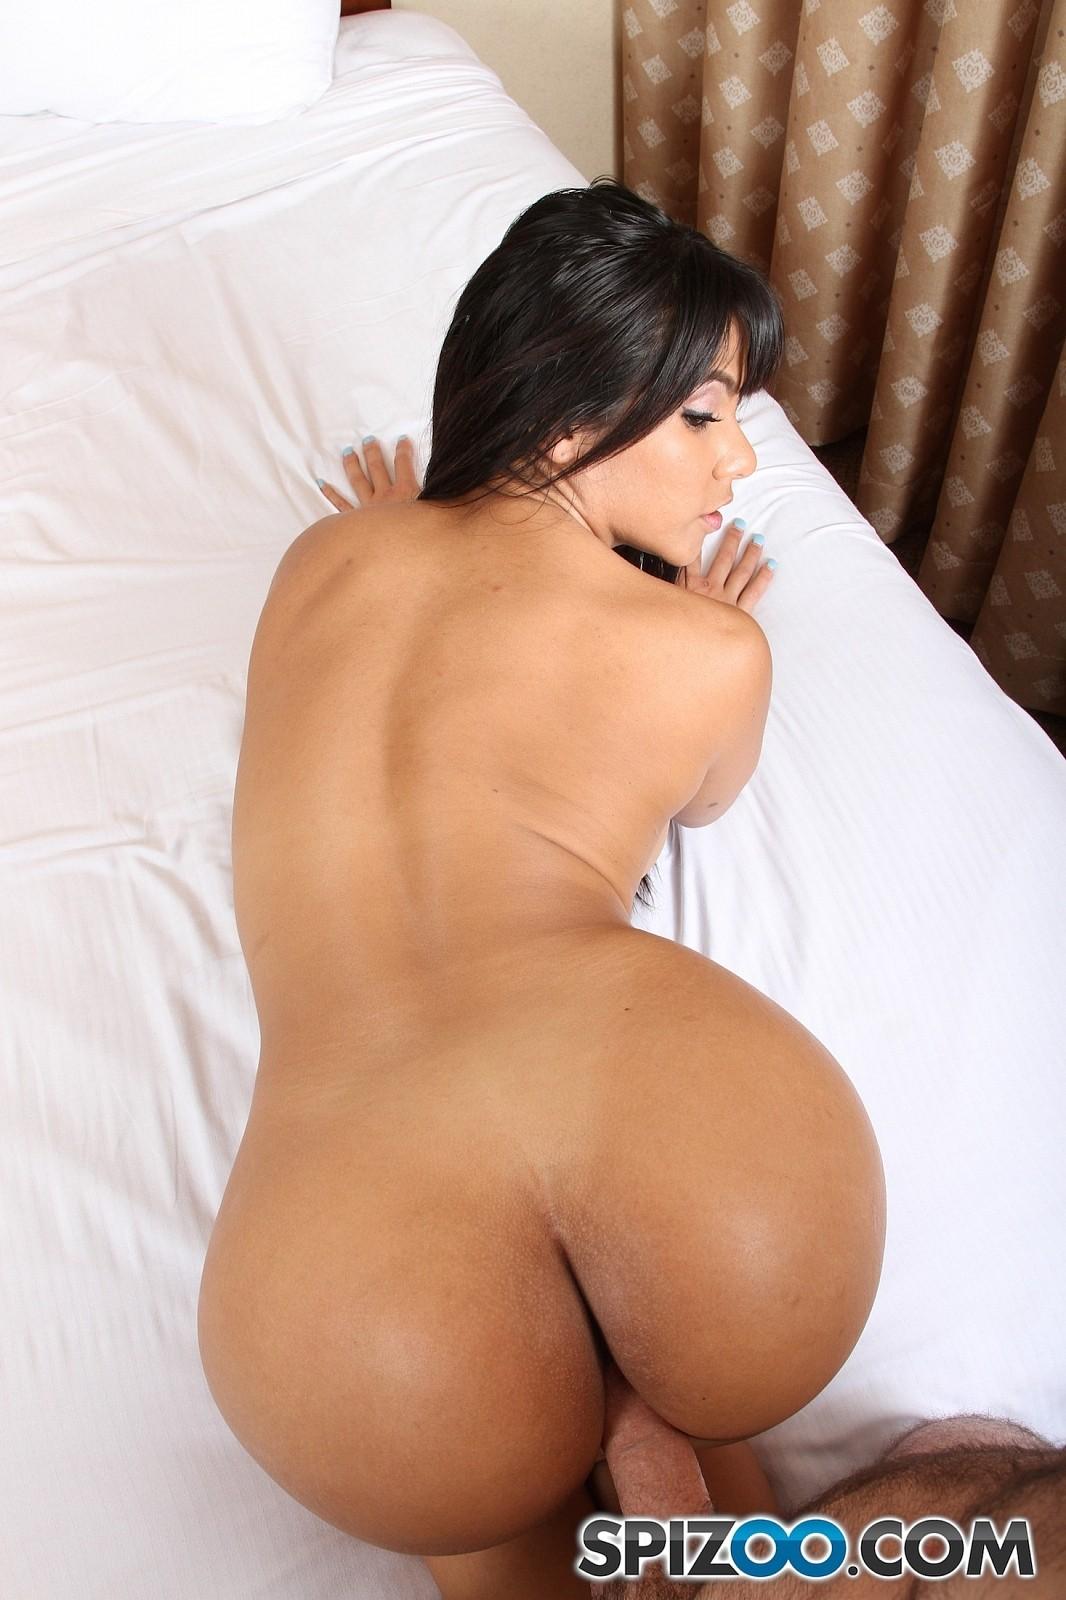 willa potter nude